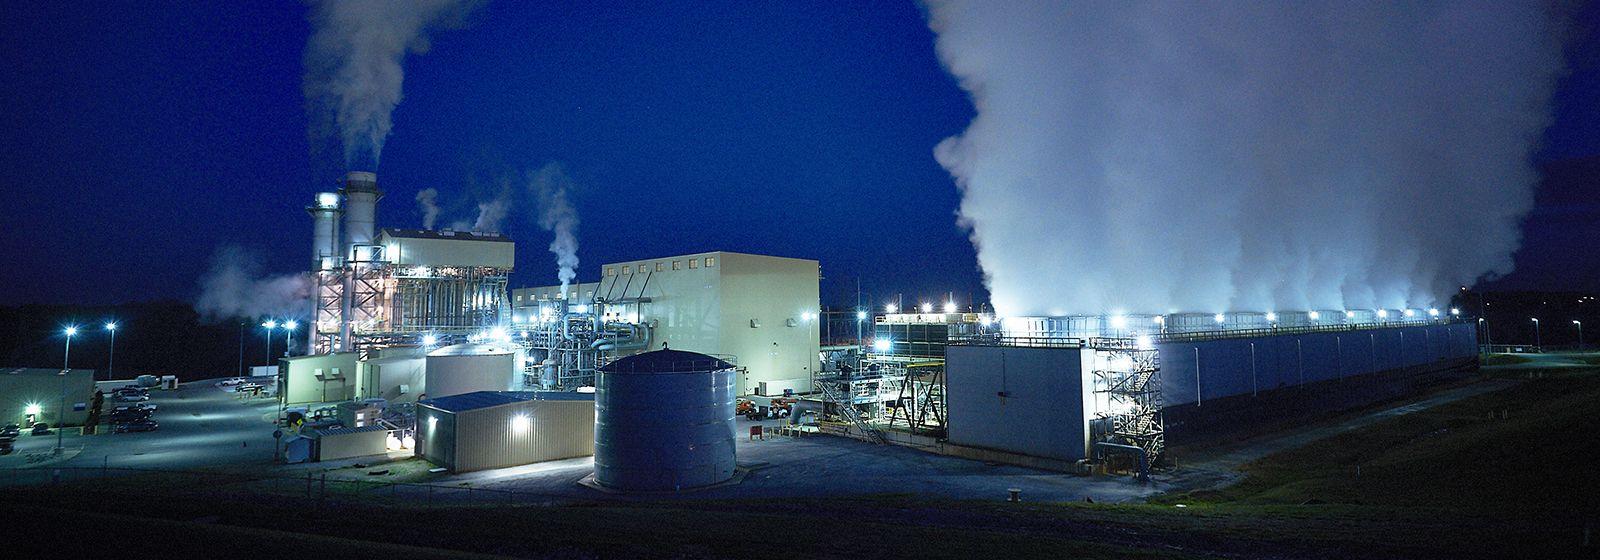 Full steam ahead at Buck power plant